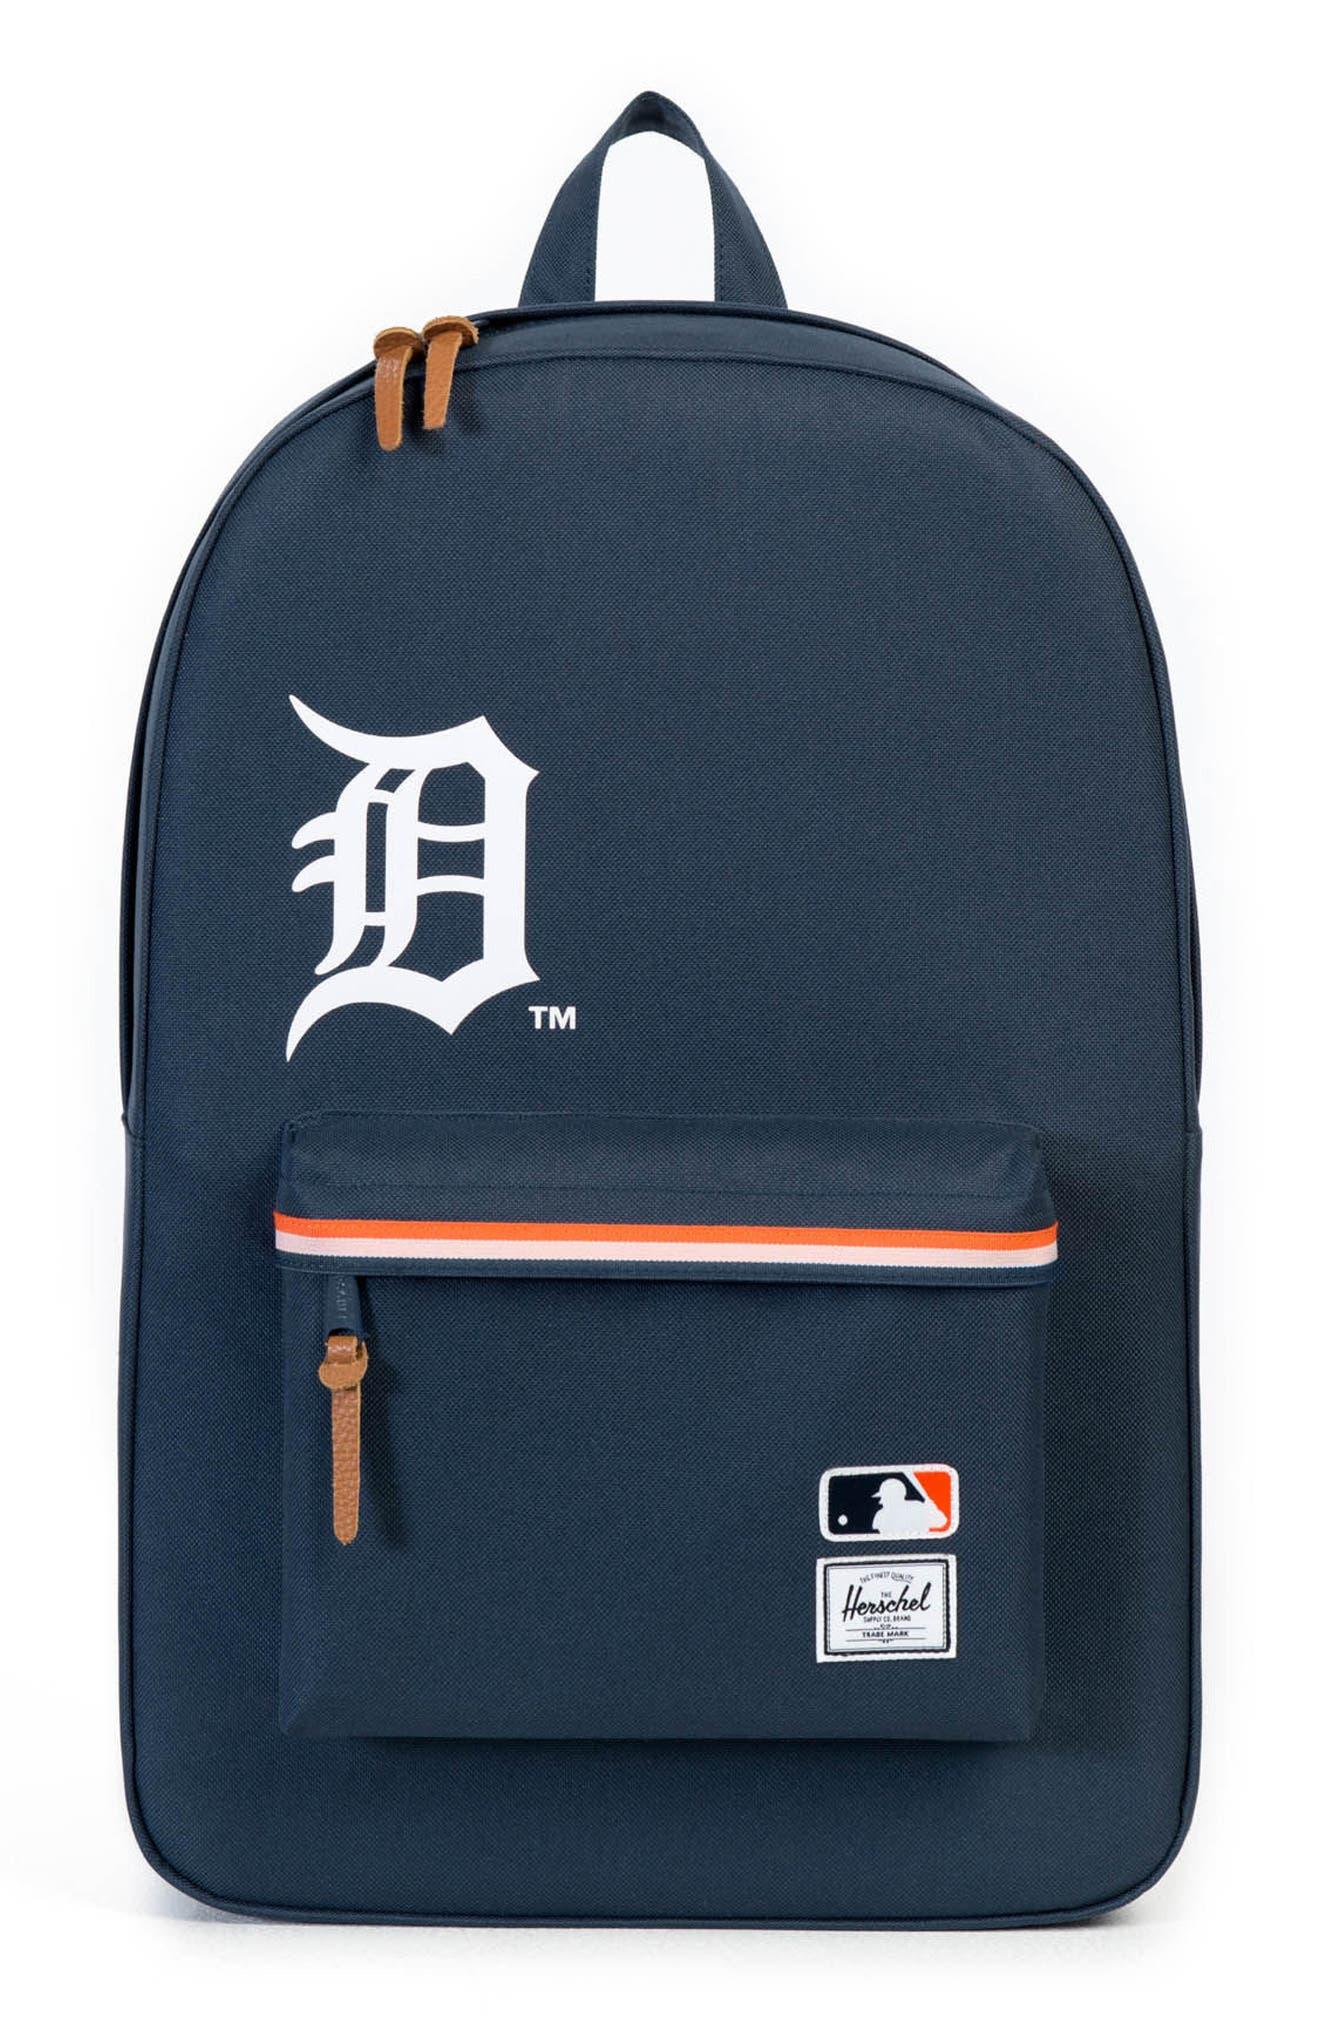 Herschel Supply Co. Heritage Detroit Tigers Backpack - Blue